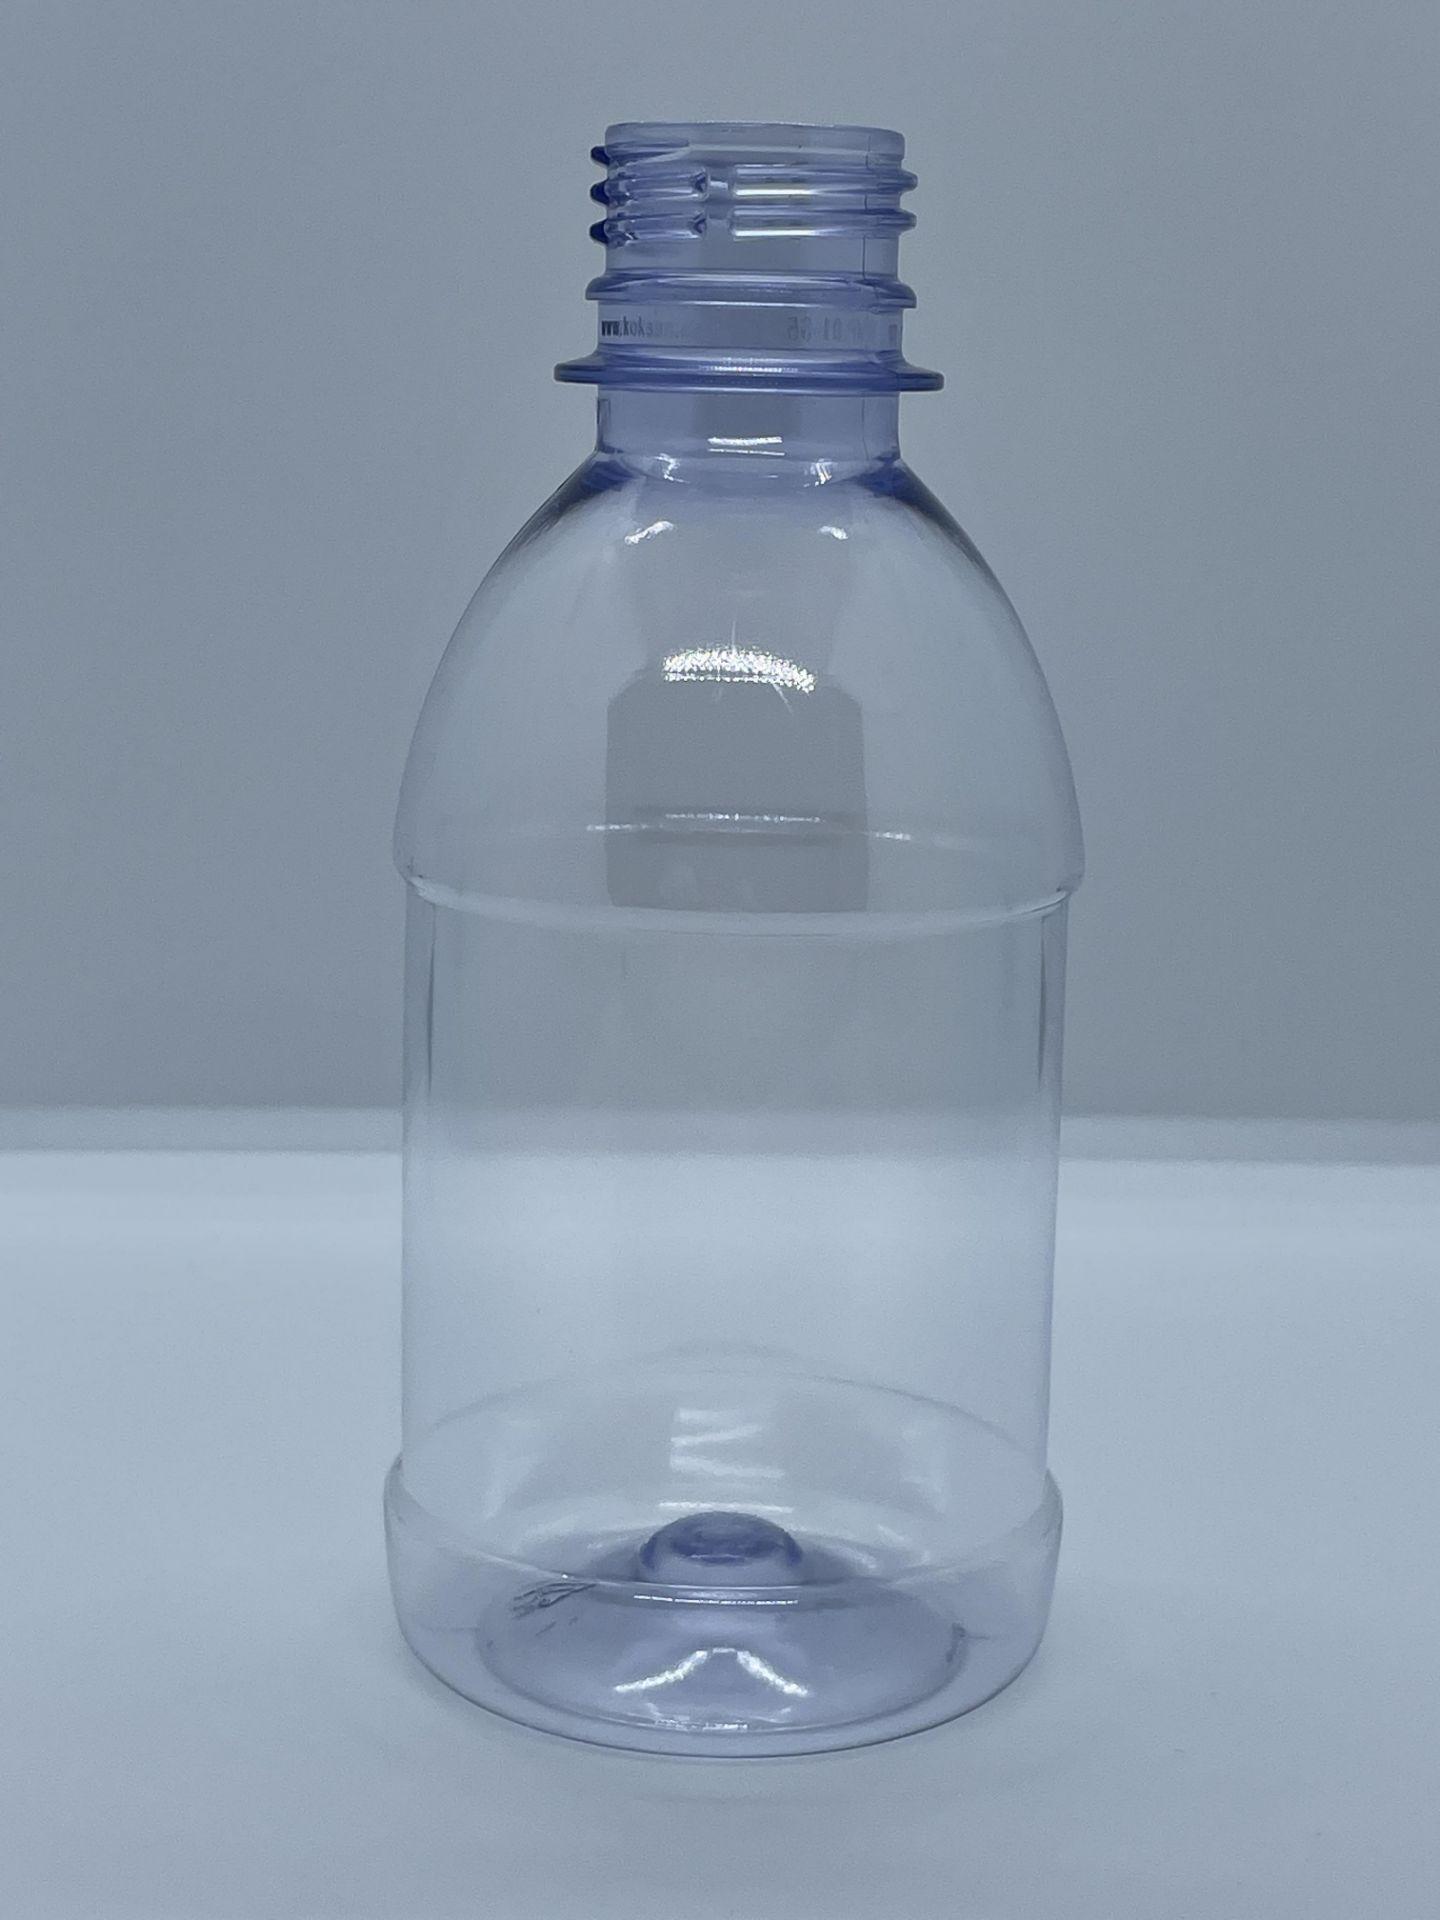 "158,000 - 8 oz Empty Plastic Bottles, Neck Threading 28-410, 5.25"" Tall x 2.25"" Diameter"